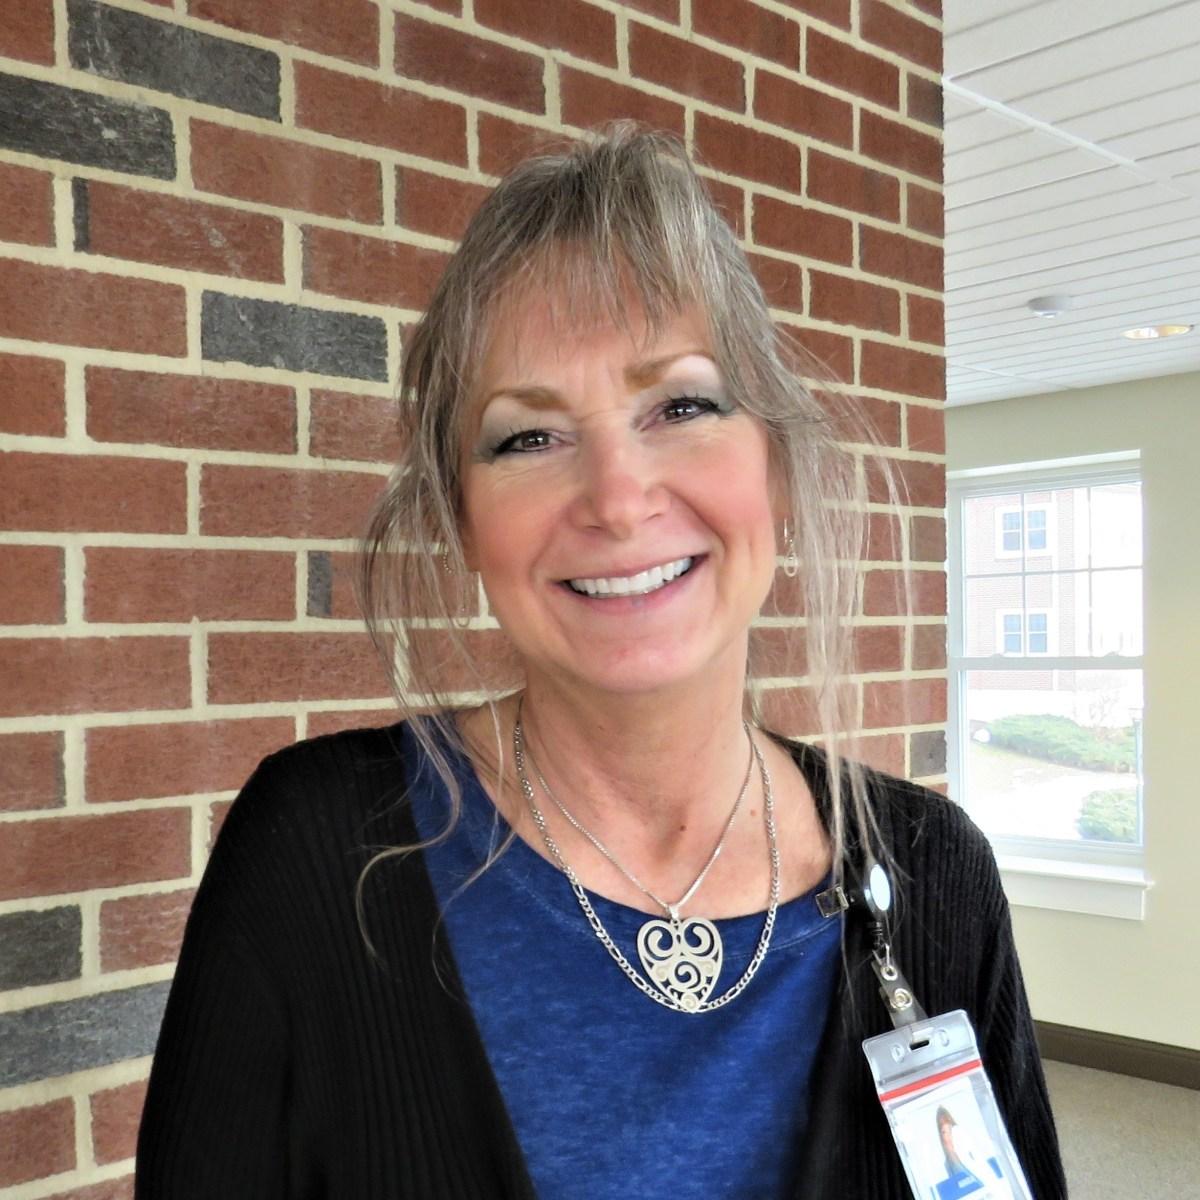 Meet the New Director of Nursing